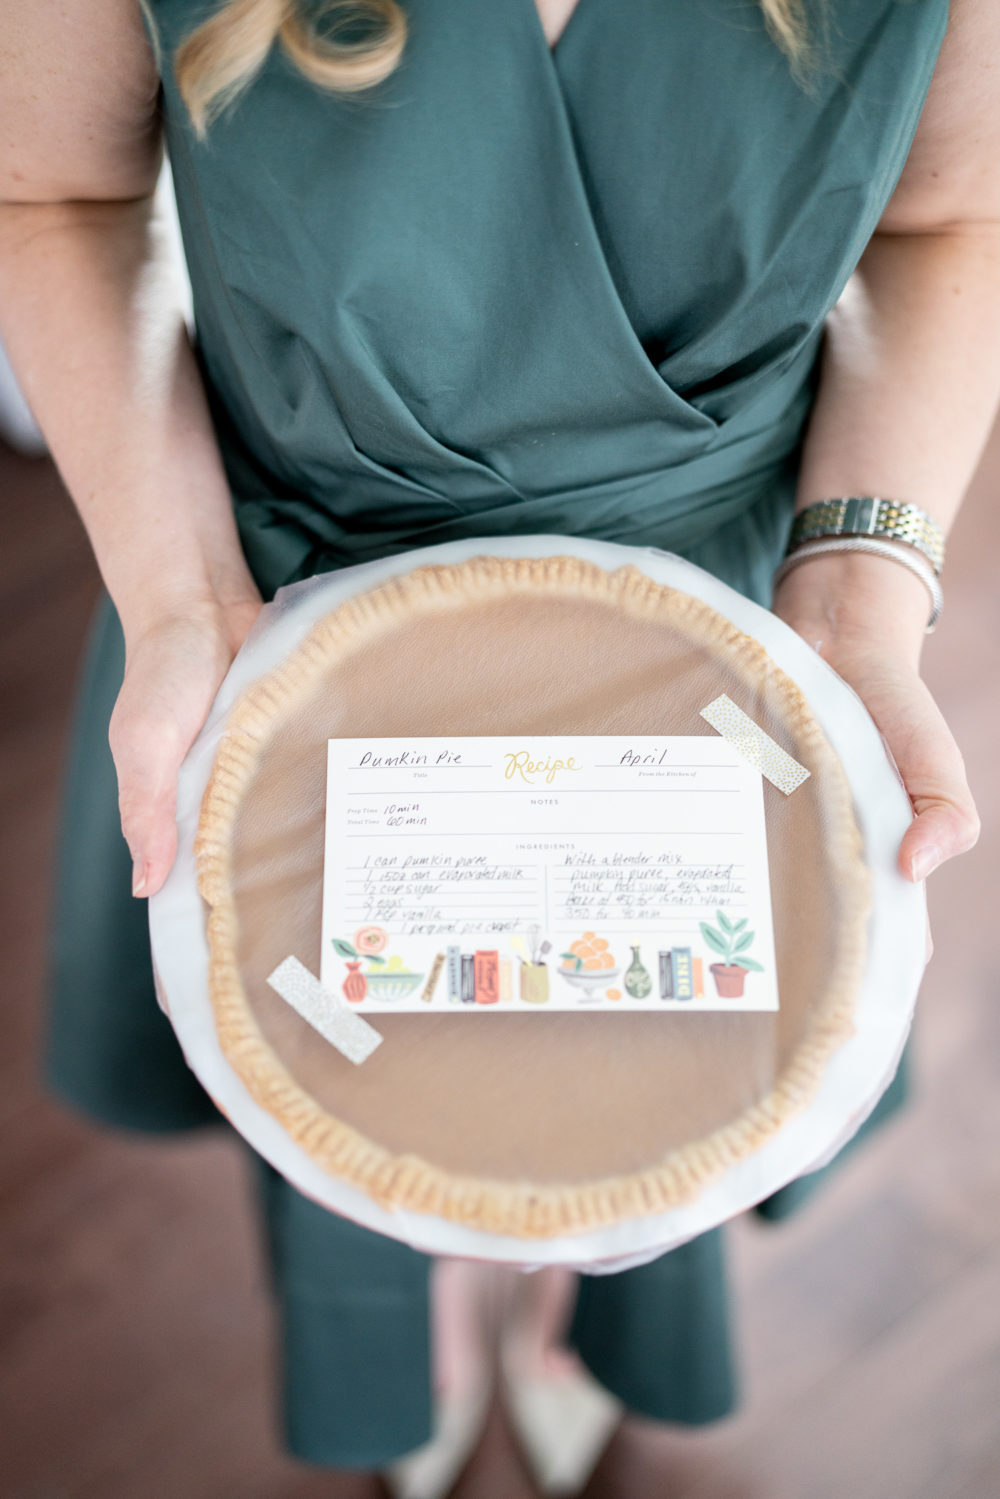 Petite Fashion Blog | FTD Flowers | FTD Thanksgiving Bouquet | Thanksgiving table decor | Thanksgiving tablescape | Pumpkin Pie recipe |